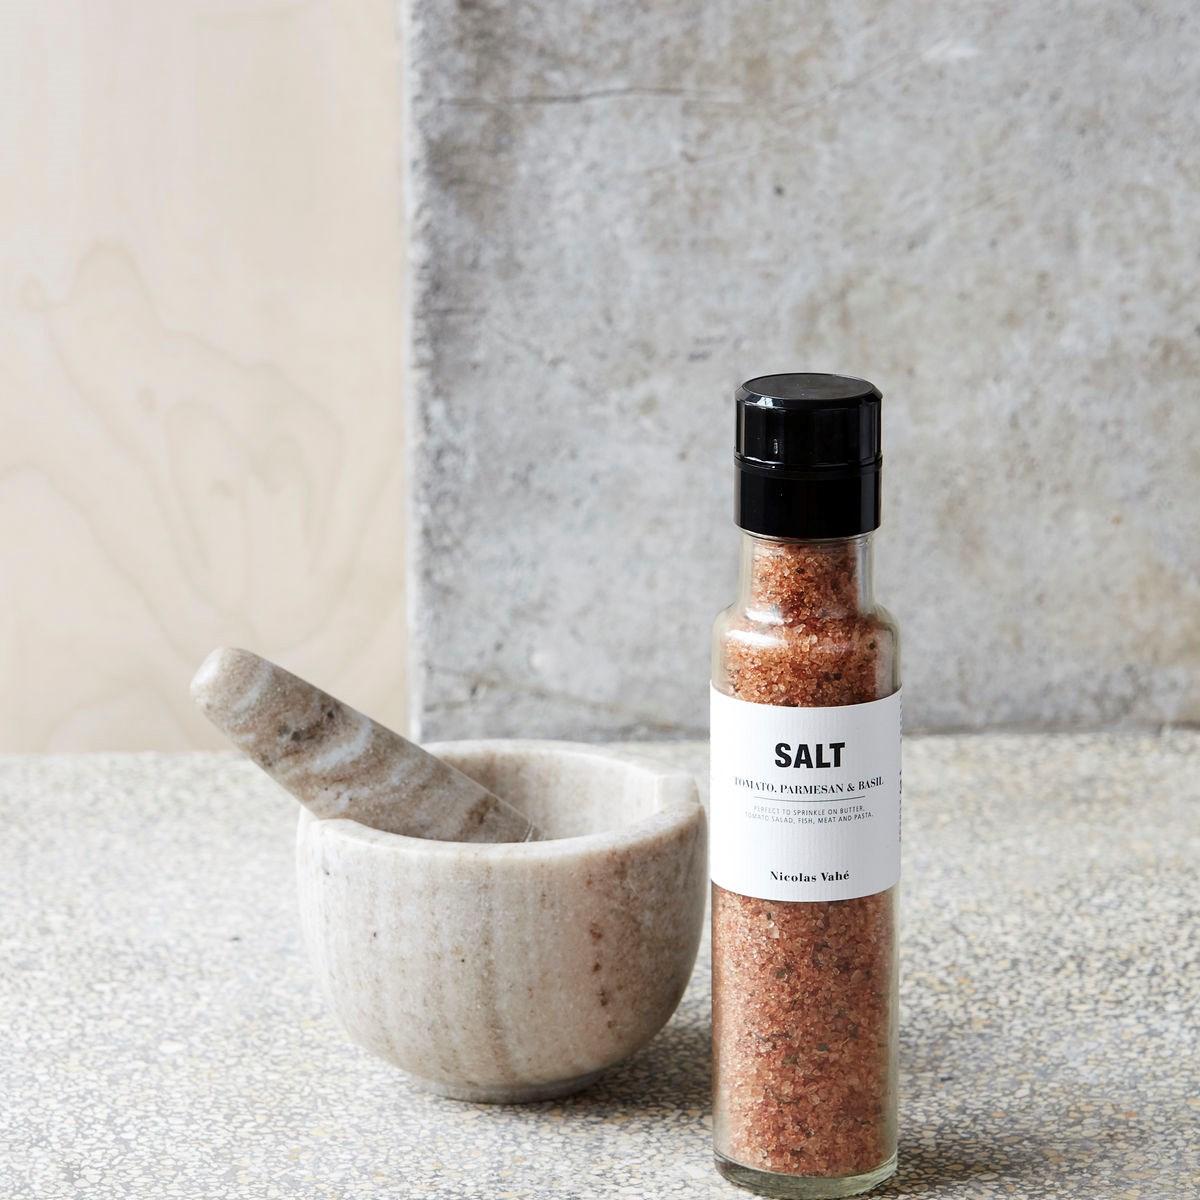 Sůl parmazán & rajče & bazalka 300 g_0